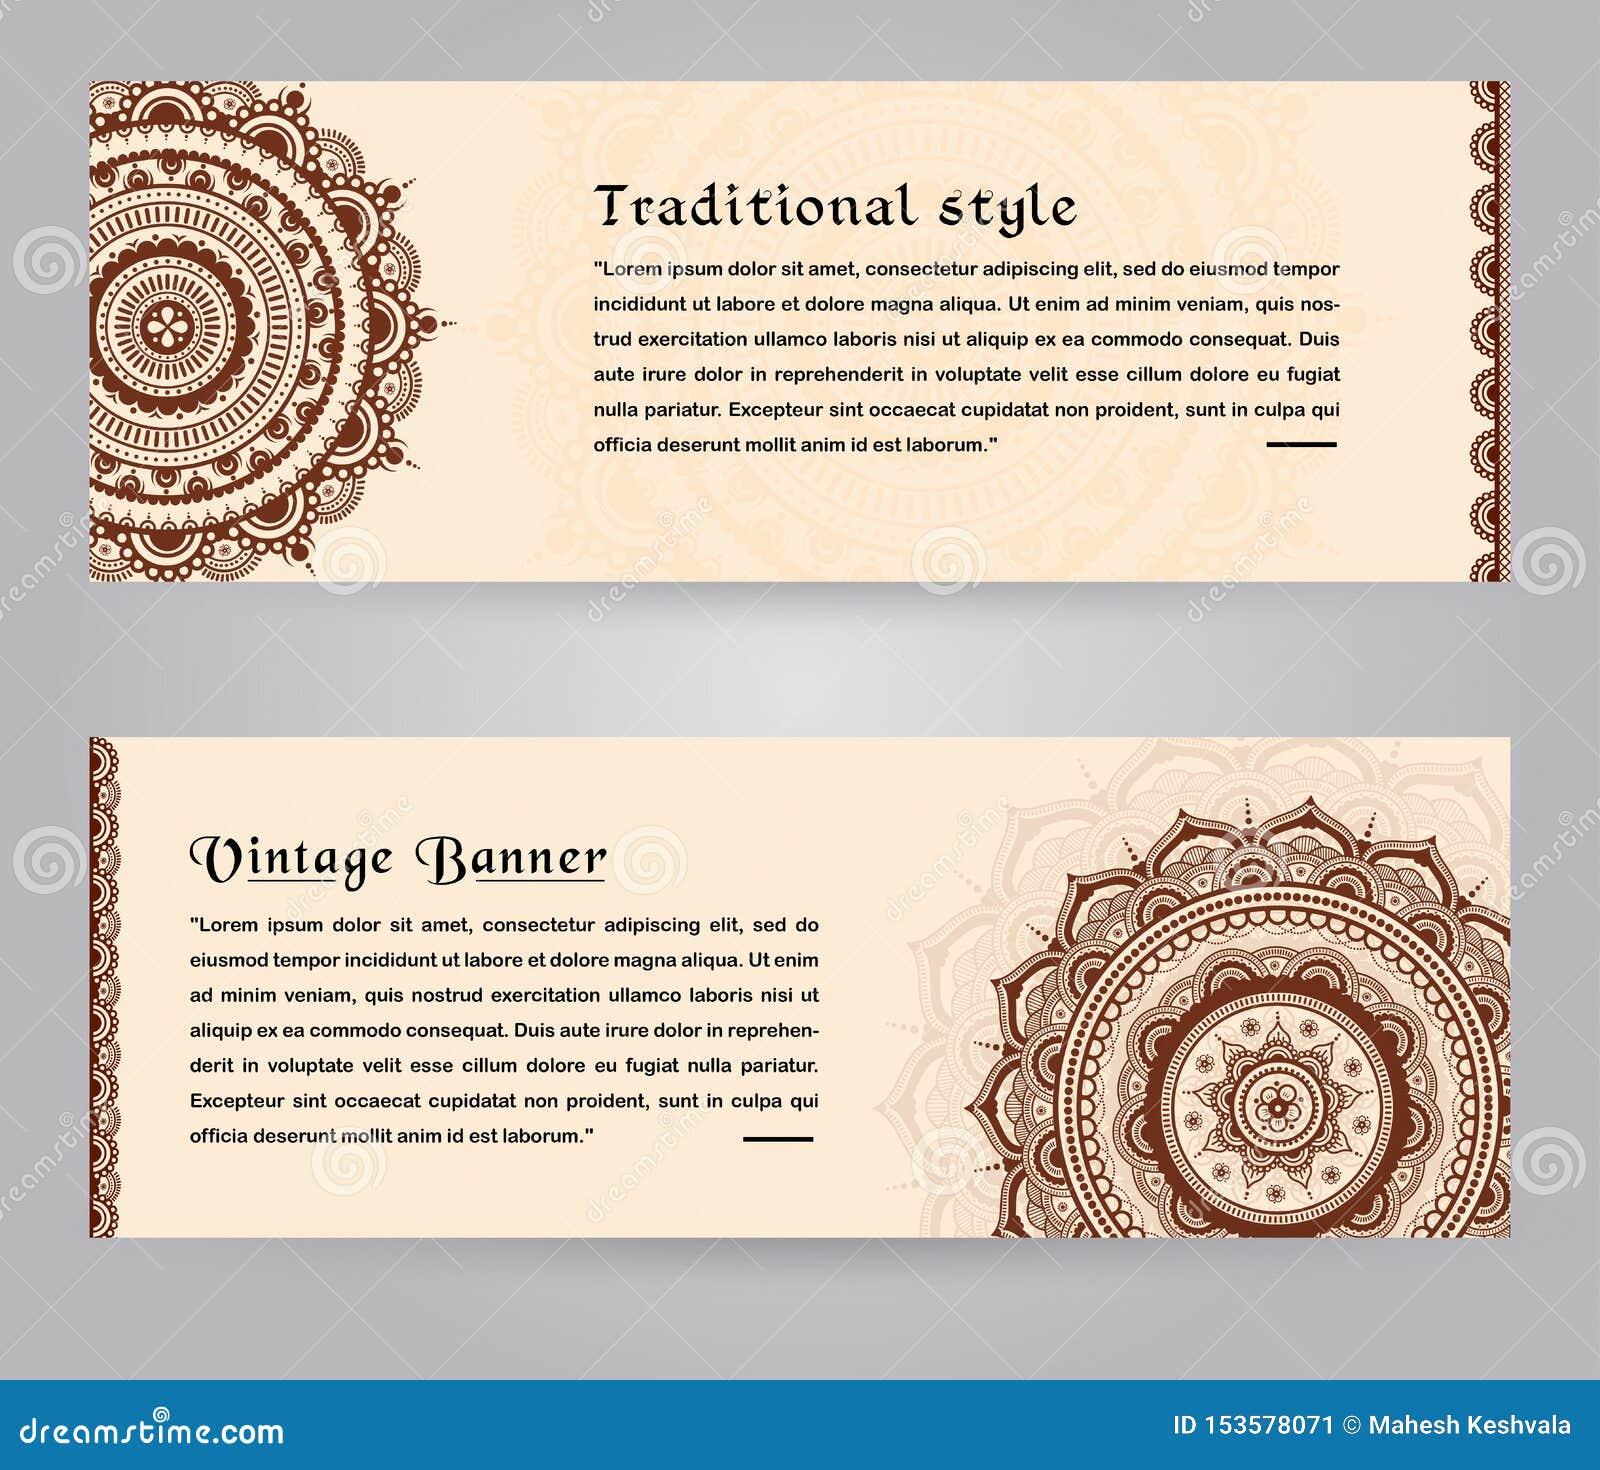 Luxury Wedding Invitation Card Design With Decorative Border